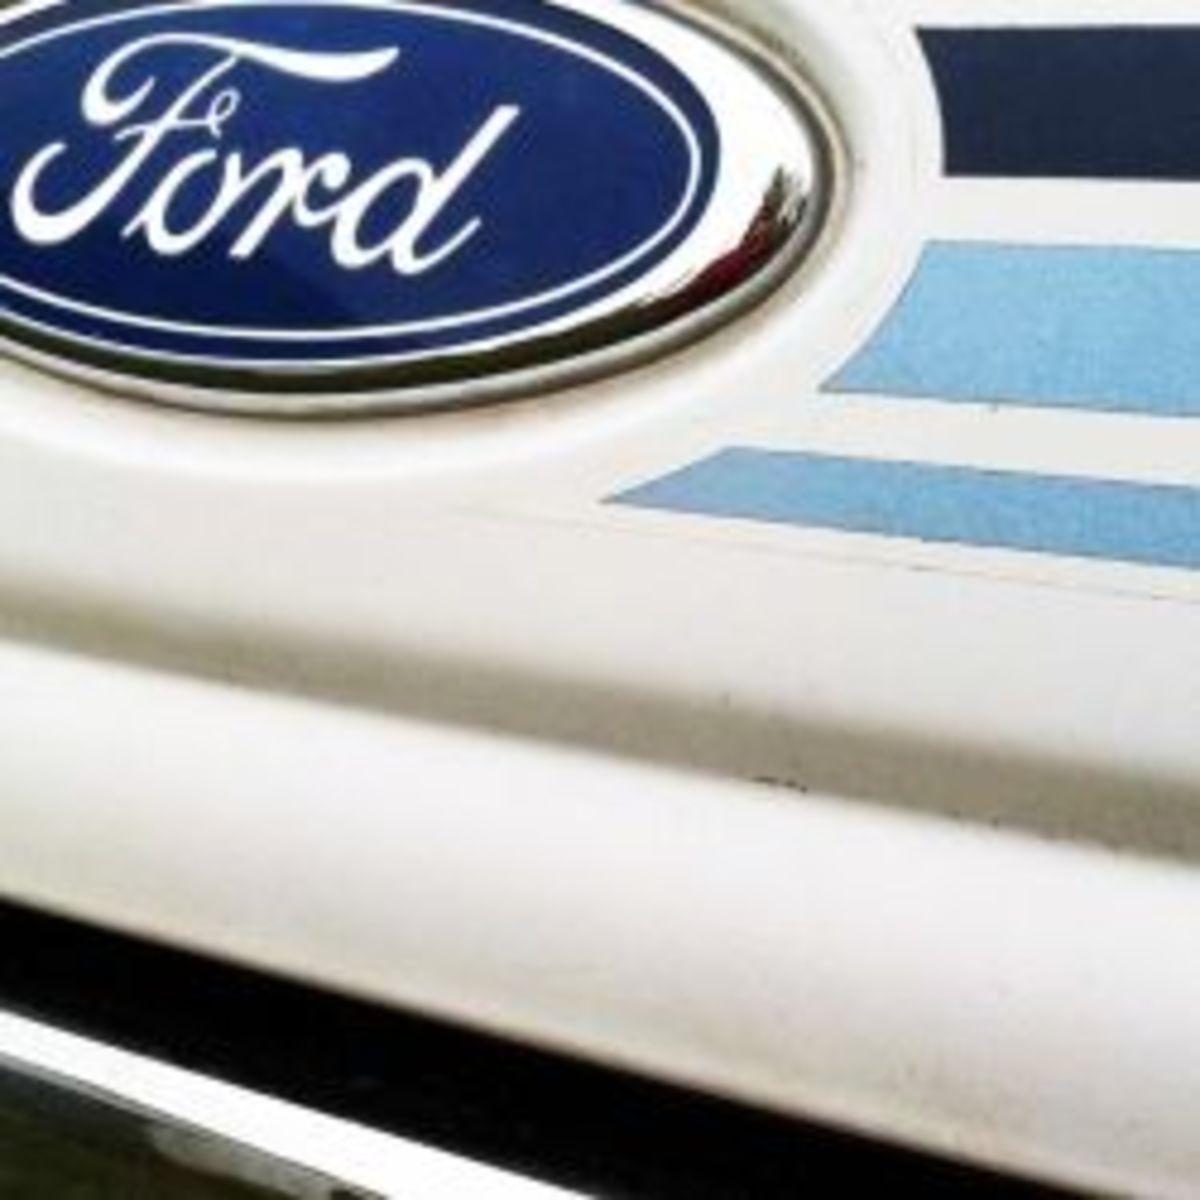 1994 Ford Econoline Conversion Van